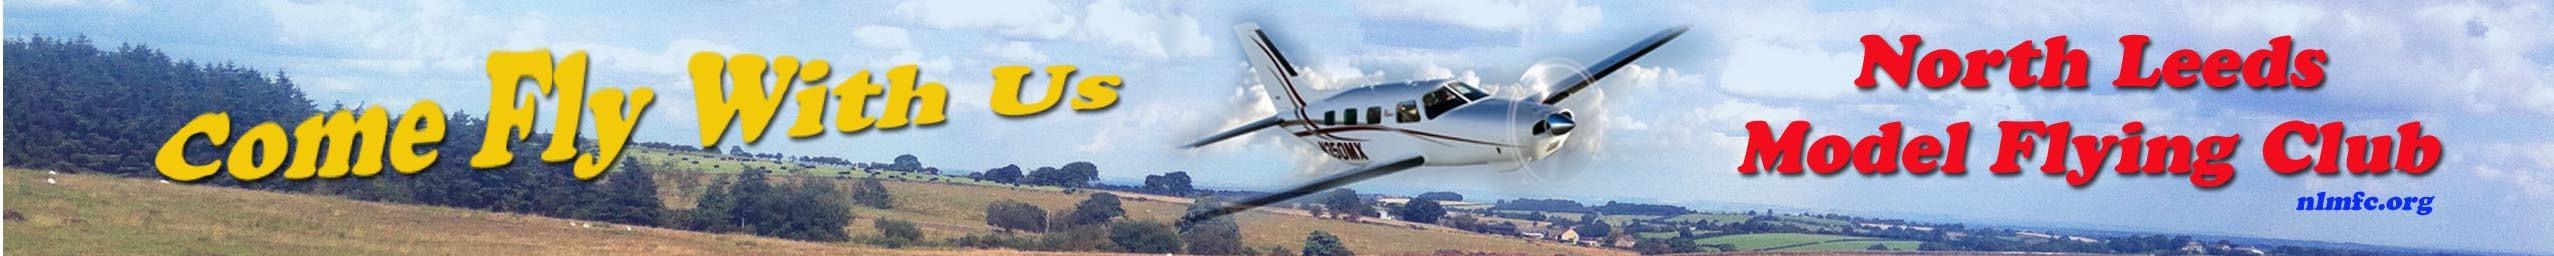 North Leeds Model Flying Club